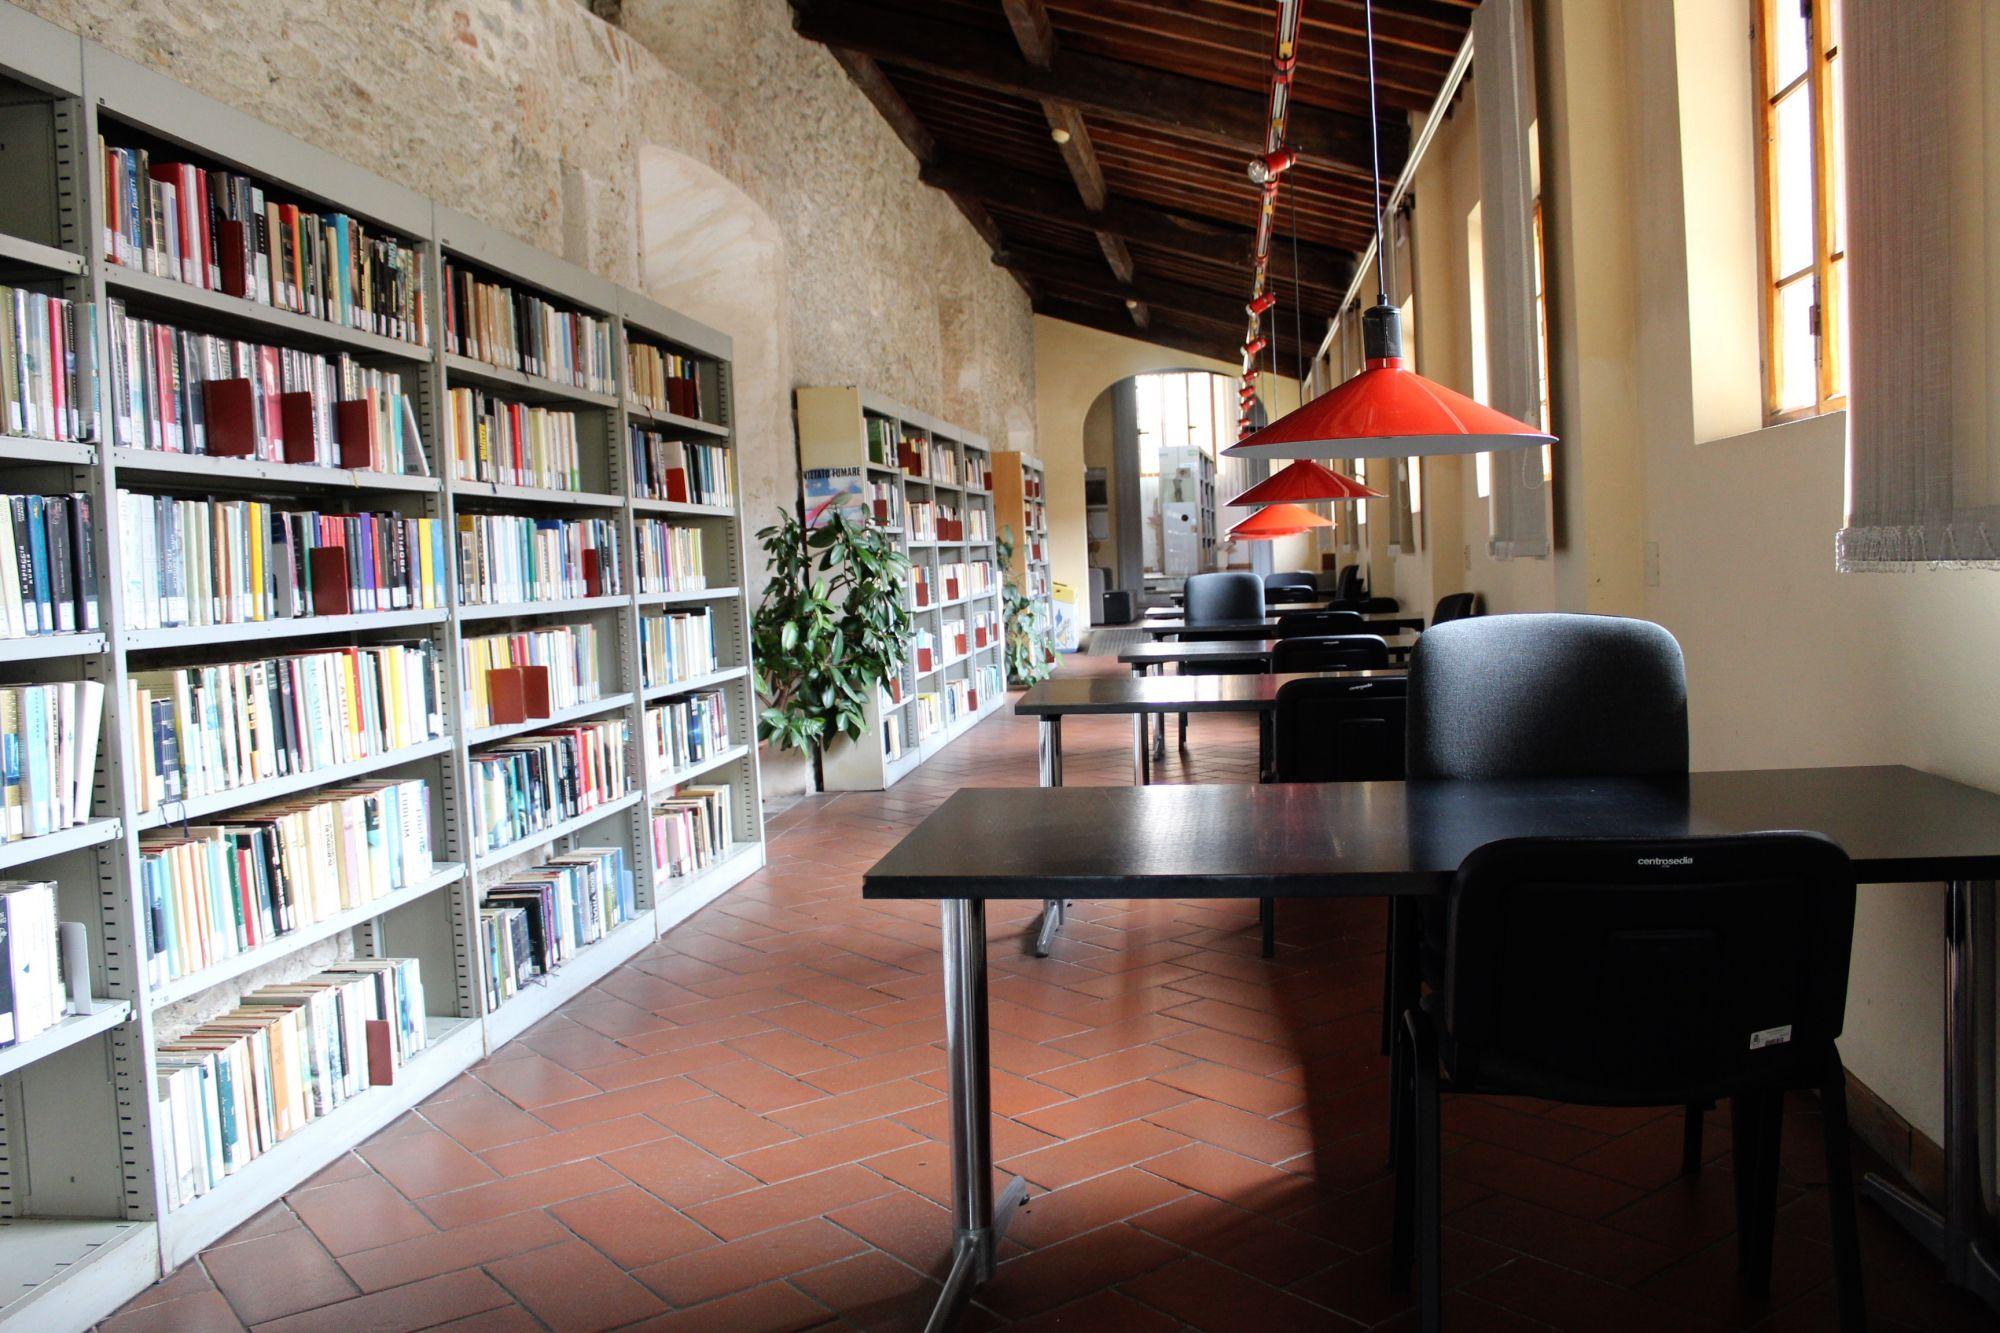 Riaperta la Biblioteca Carducci di Pietrasanta